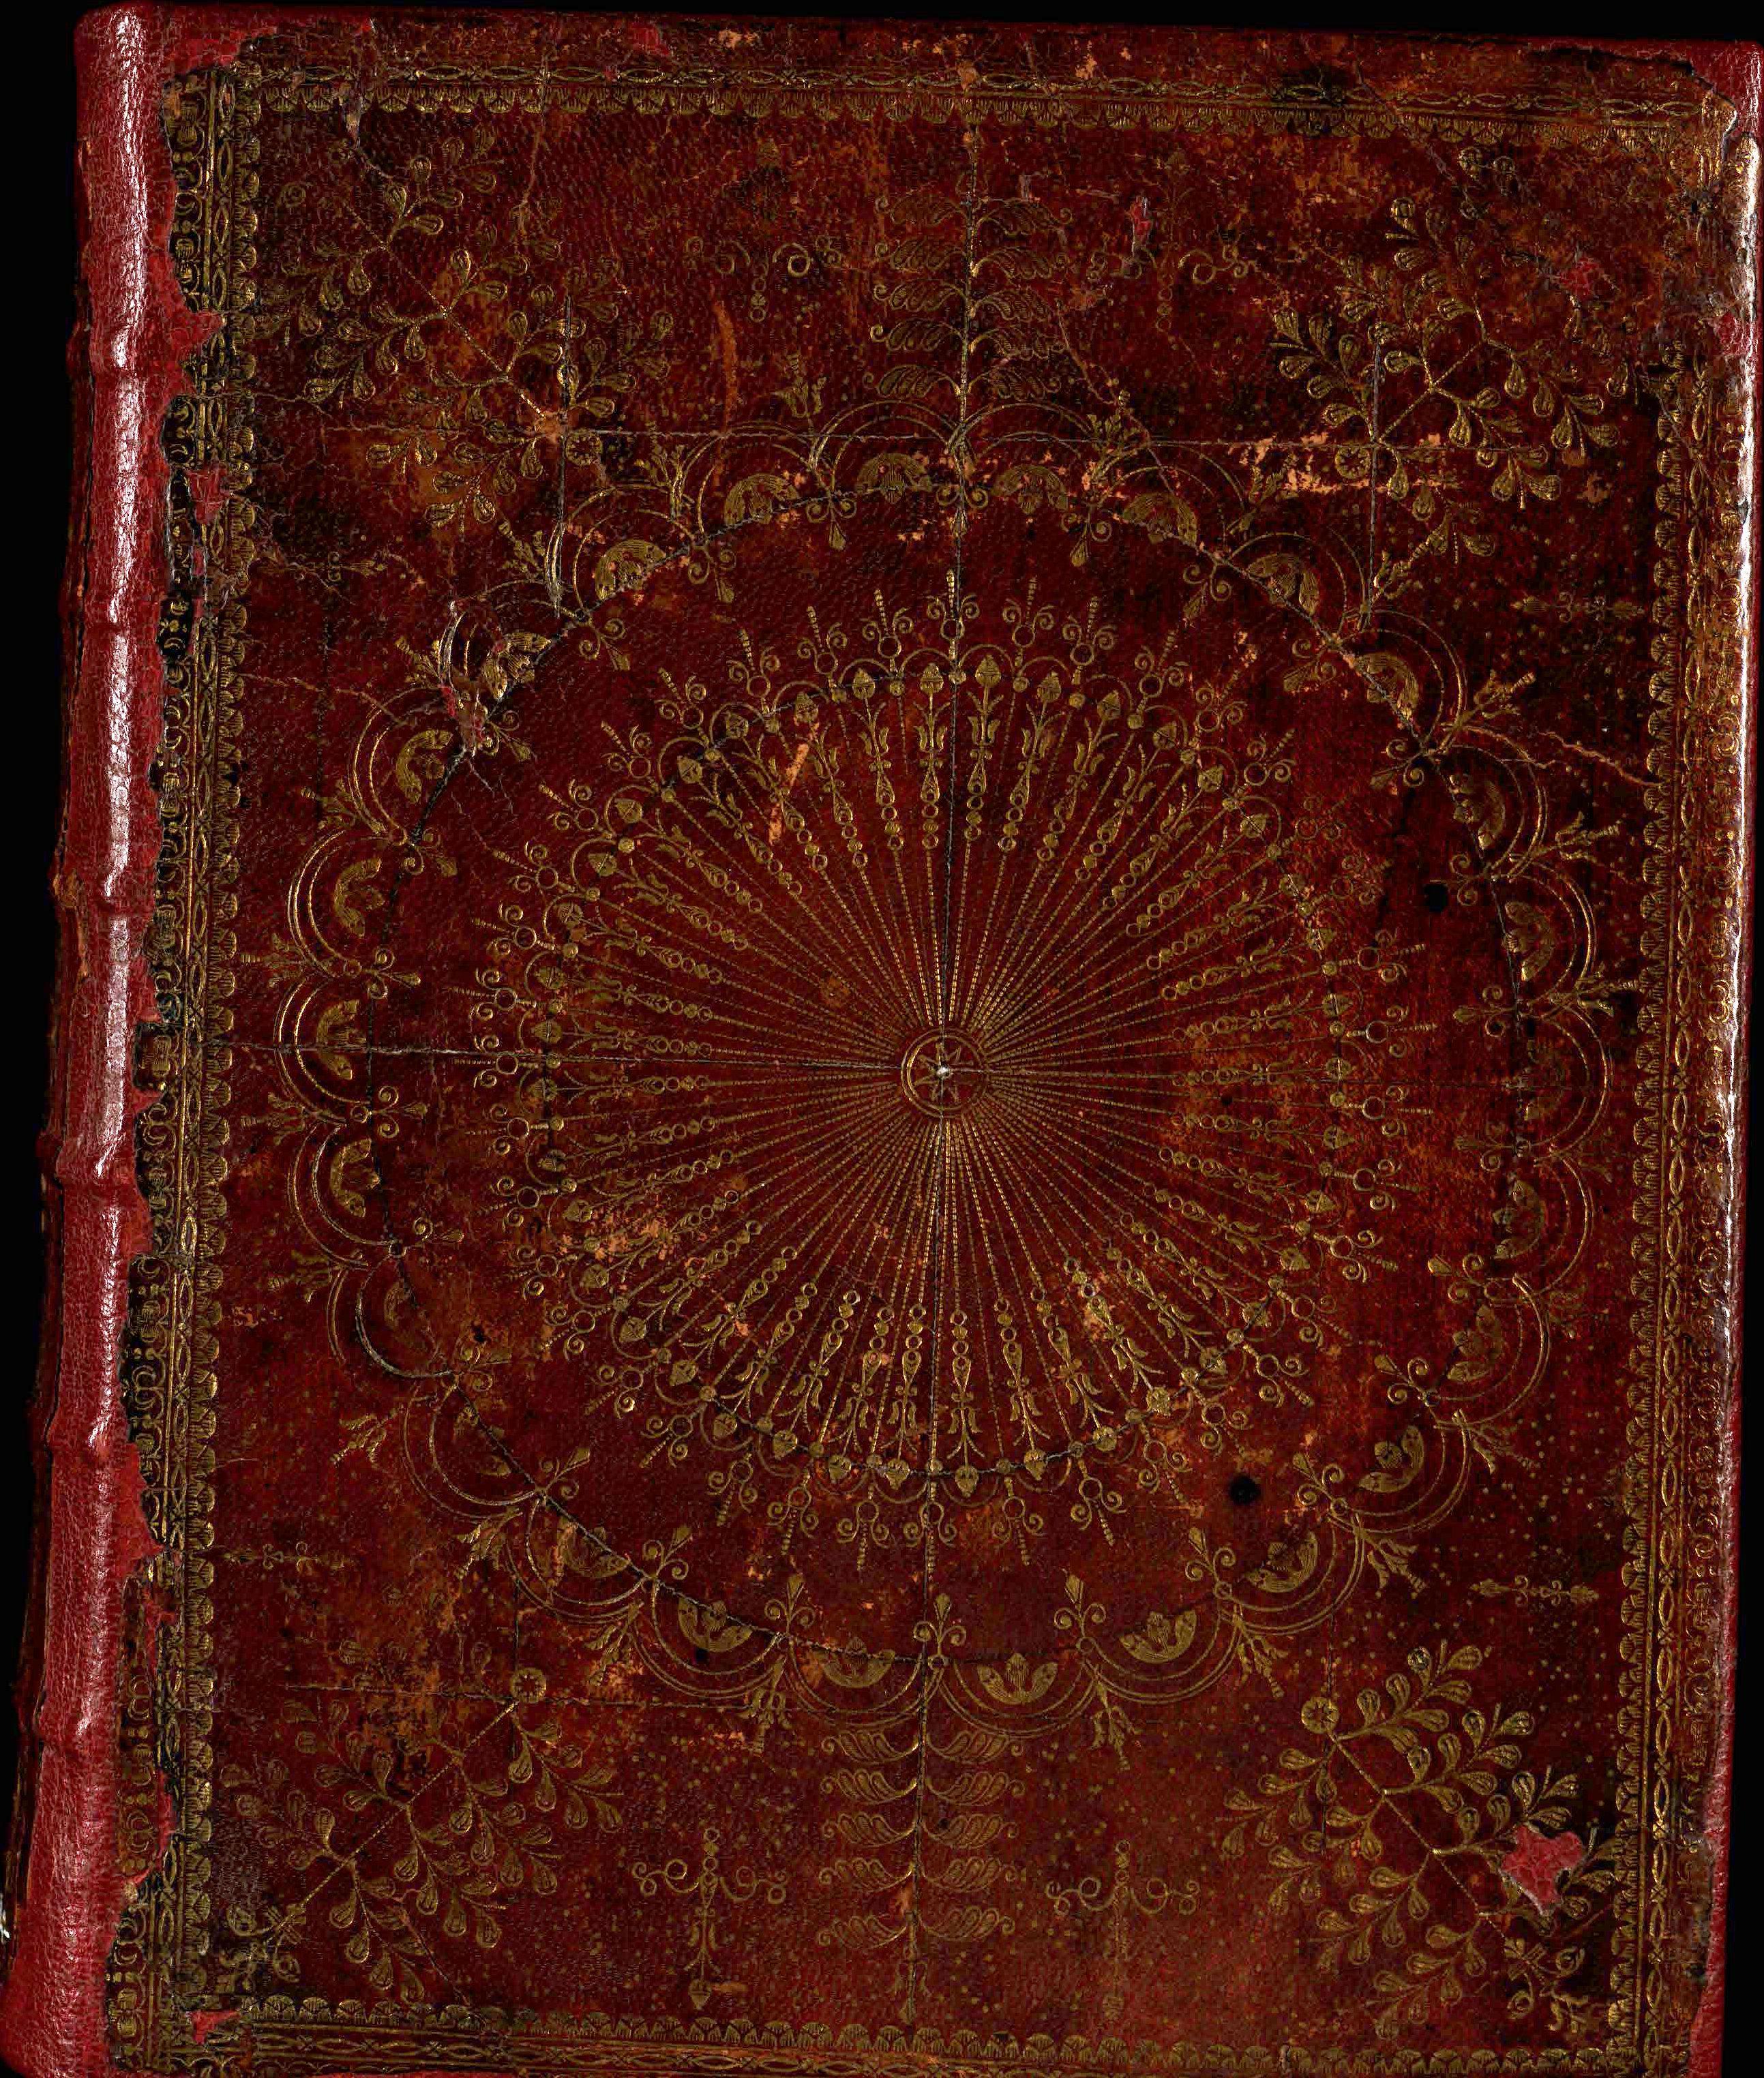 18th Century Scottish Bookbinding: The Wheel Pattern